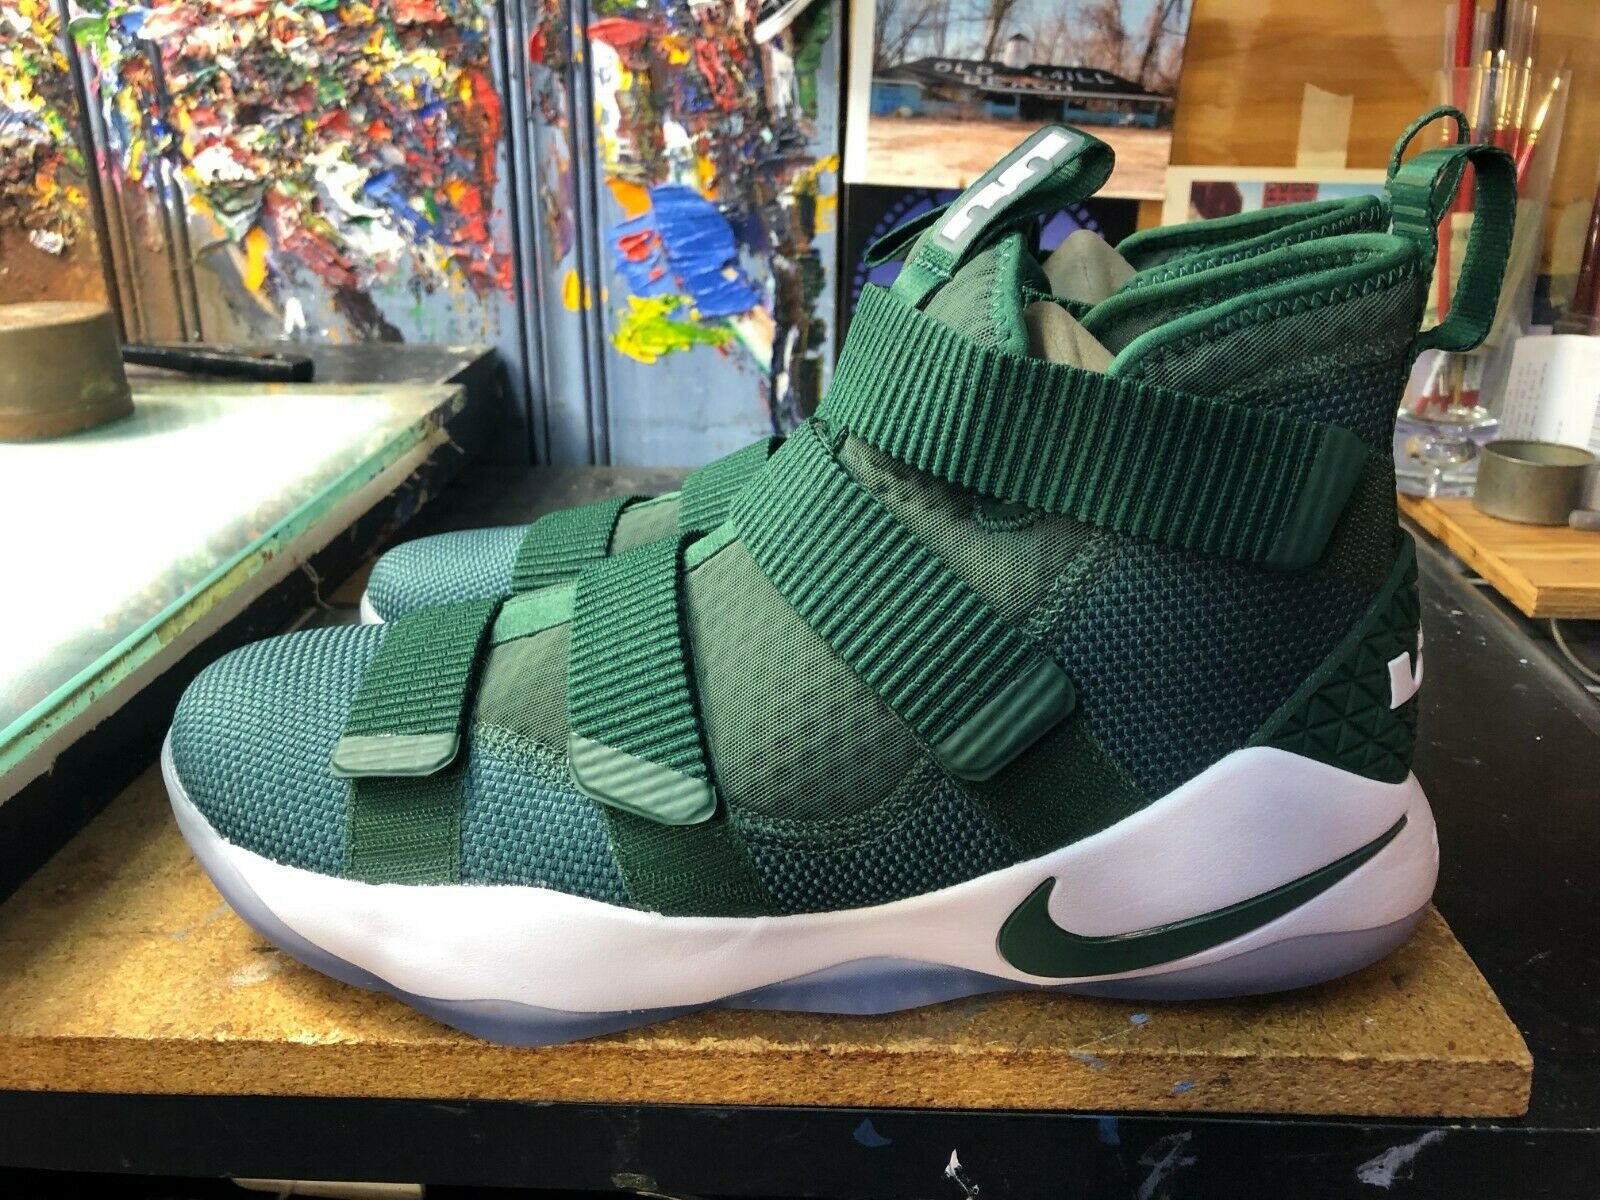 Nike LeBron Soldier XI TB Promo Fir Green White Size US 13 Men 943155 302 New